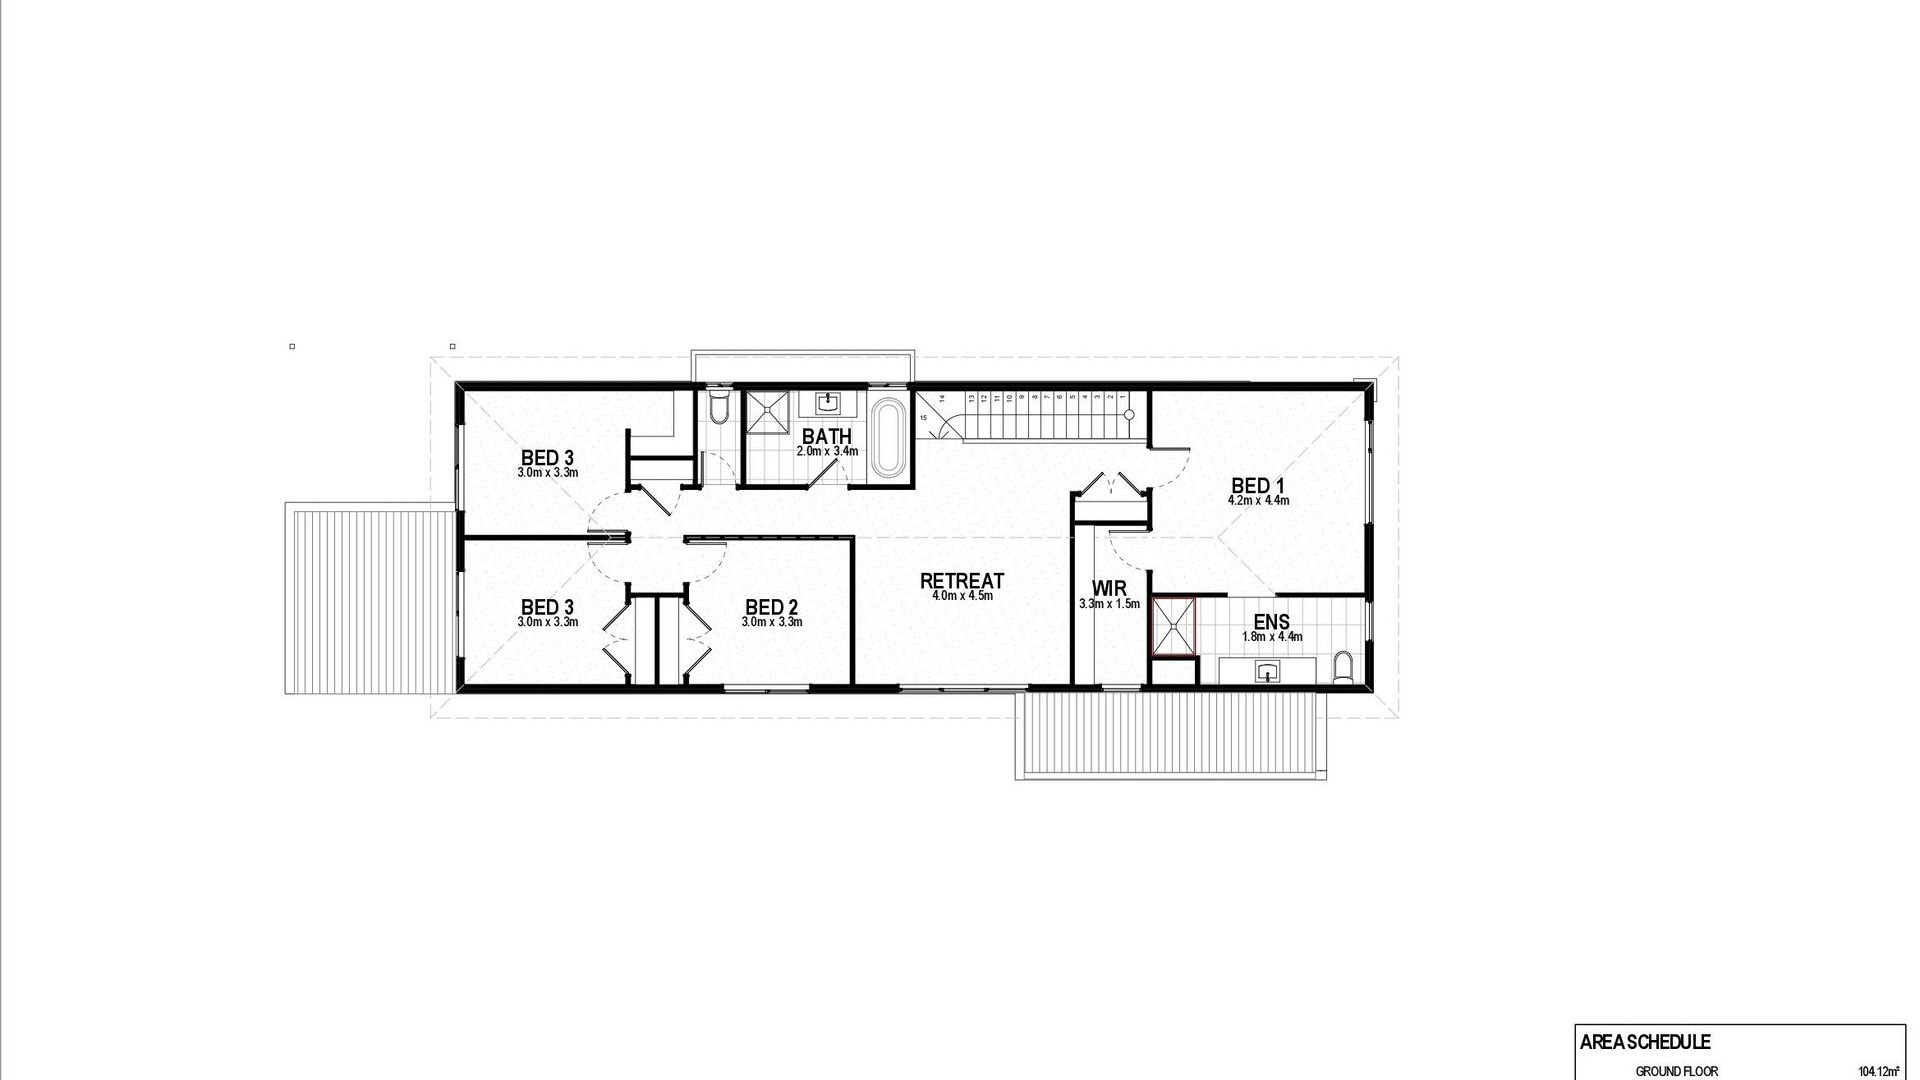 Lot 268 Fiorelli Boulevard, Cranbourne East VIC 3977, Image 1